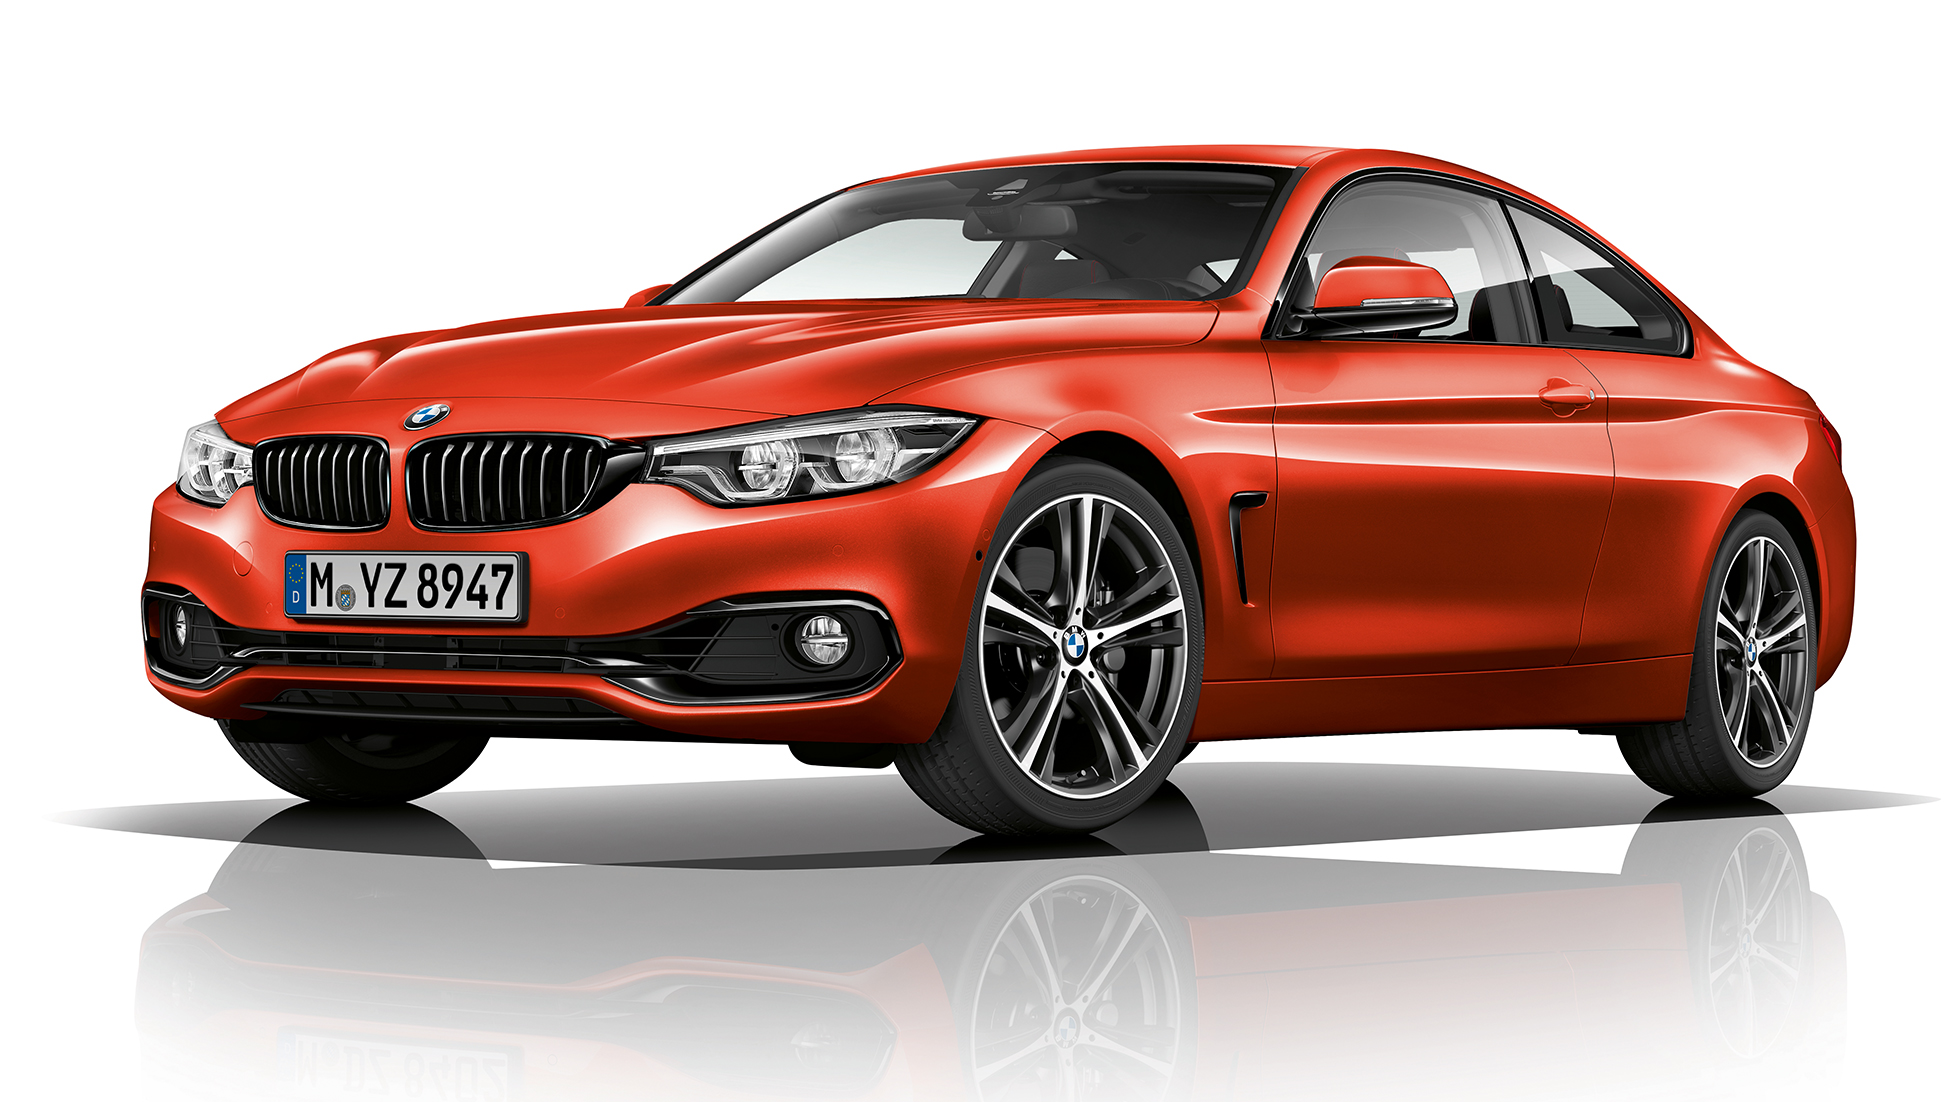 bmw-4-series-coupe-inform-lines-sport-line-01